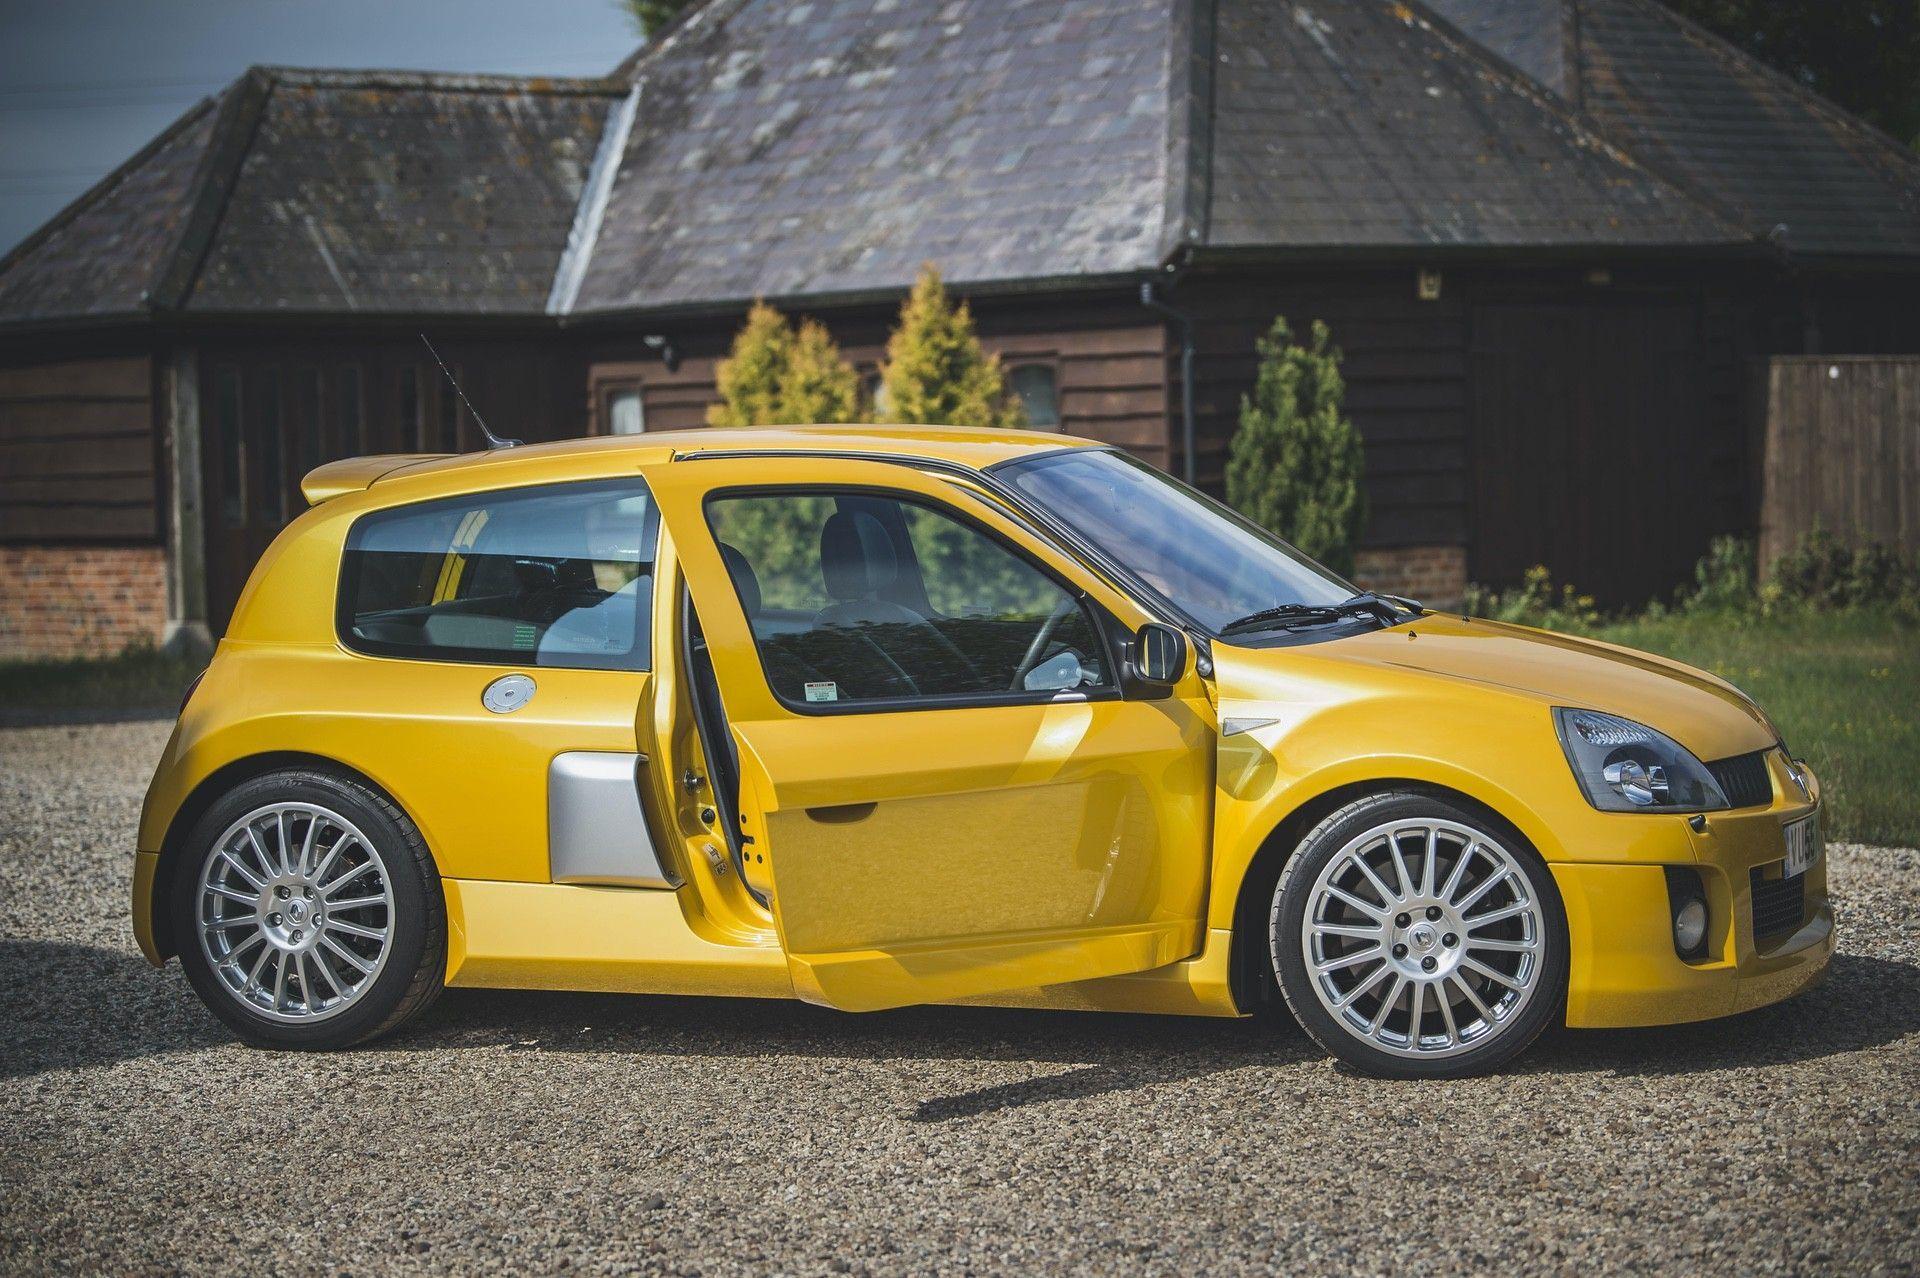 2005_Renault_Clio_V6_Phase_2_0019